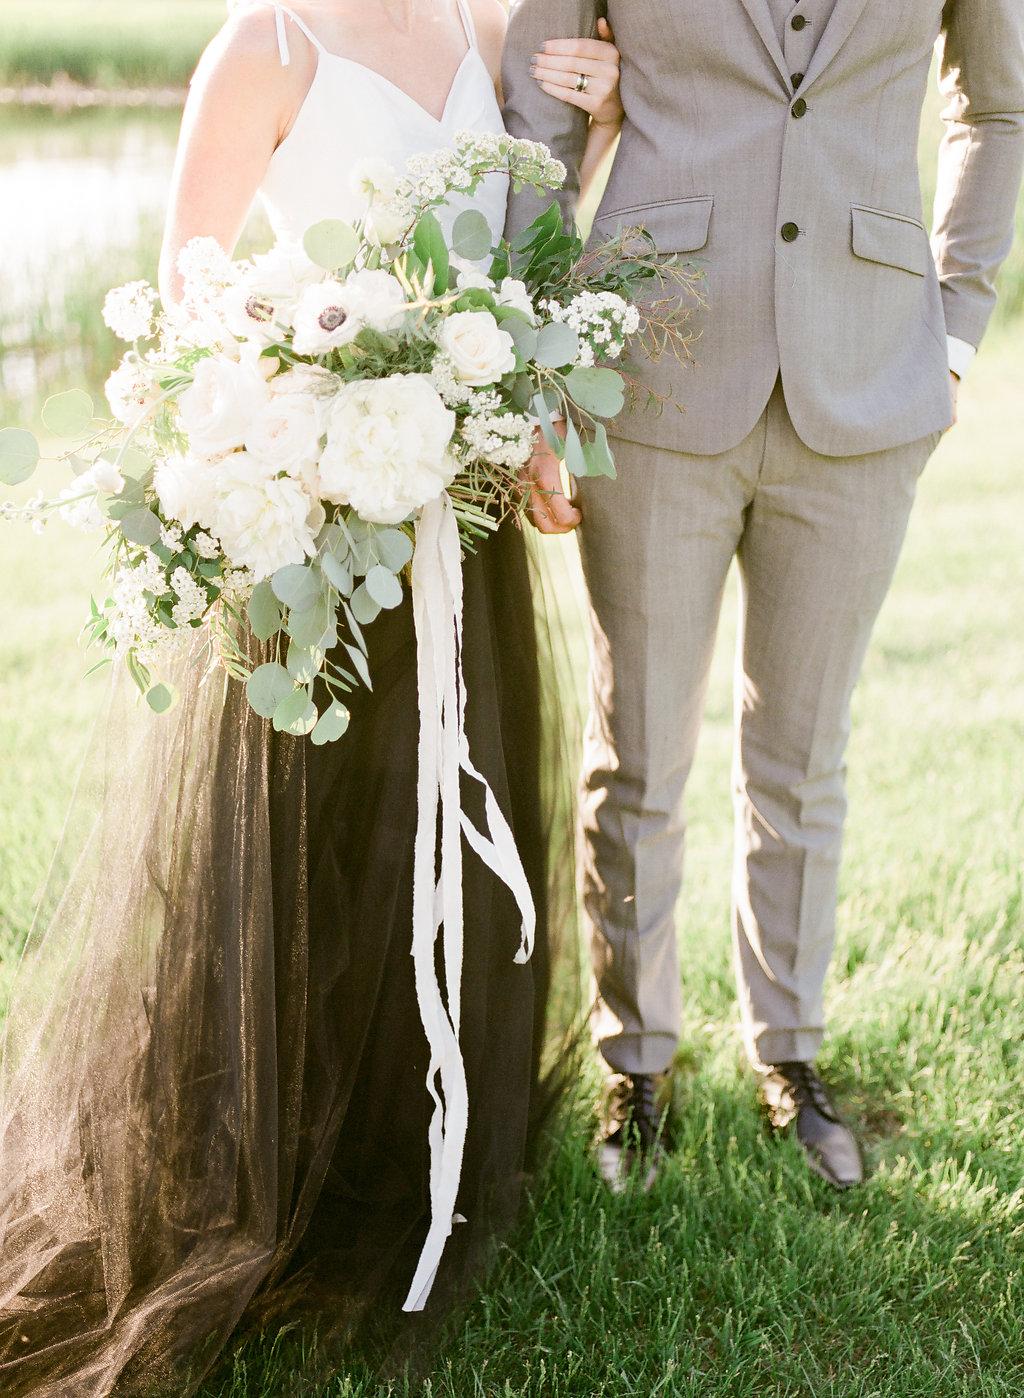 Prairie Wedding Inspiration | Esther Funk Photography | Joy Wed | http://www.joy-wed.com